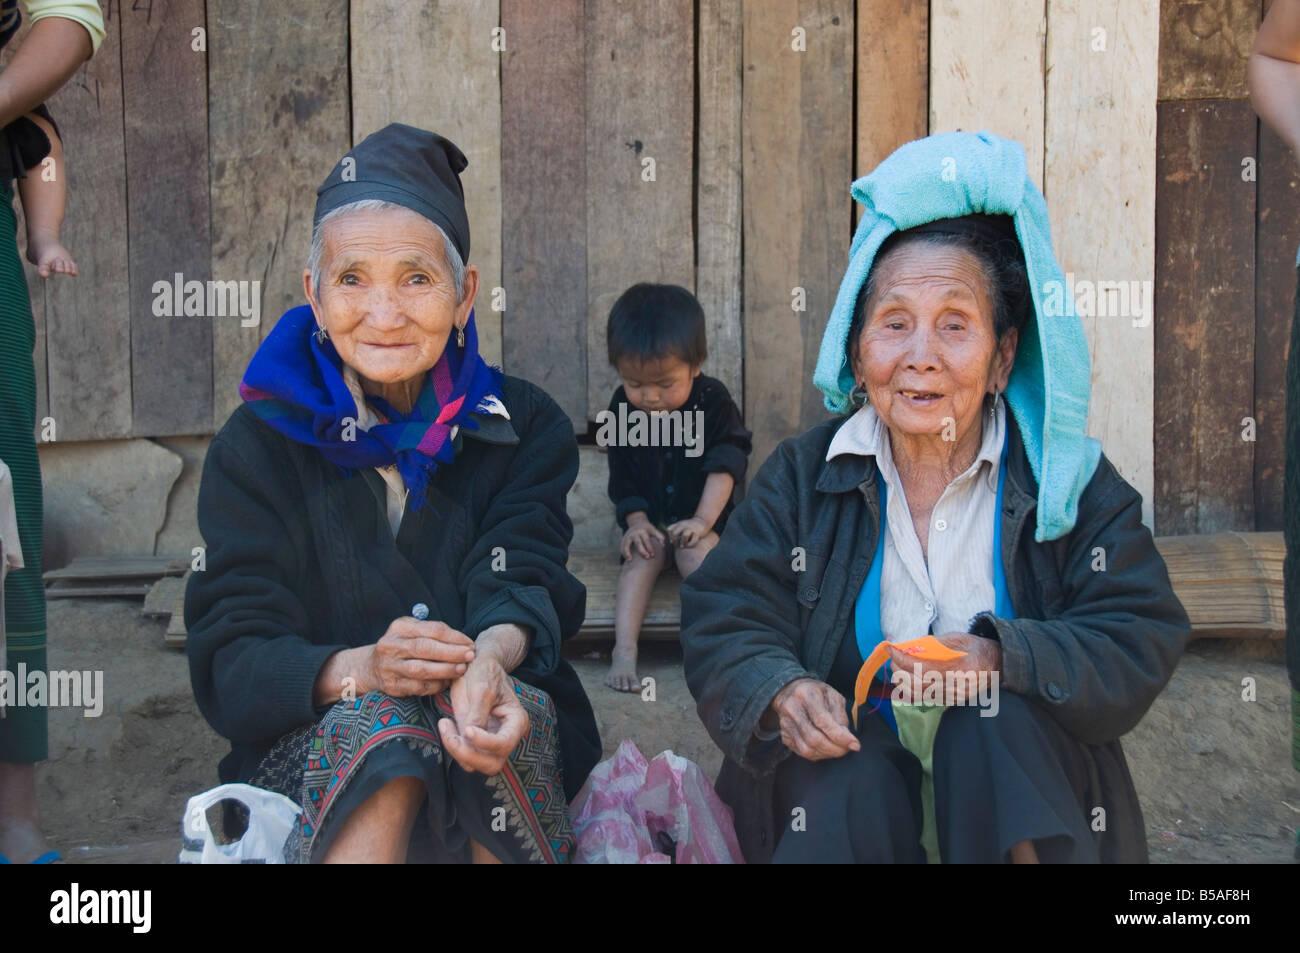 Hmong tribal village women selling handicrafts, Luang Prabang, Laos, Indochina, Southeast Asia - Stock Image